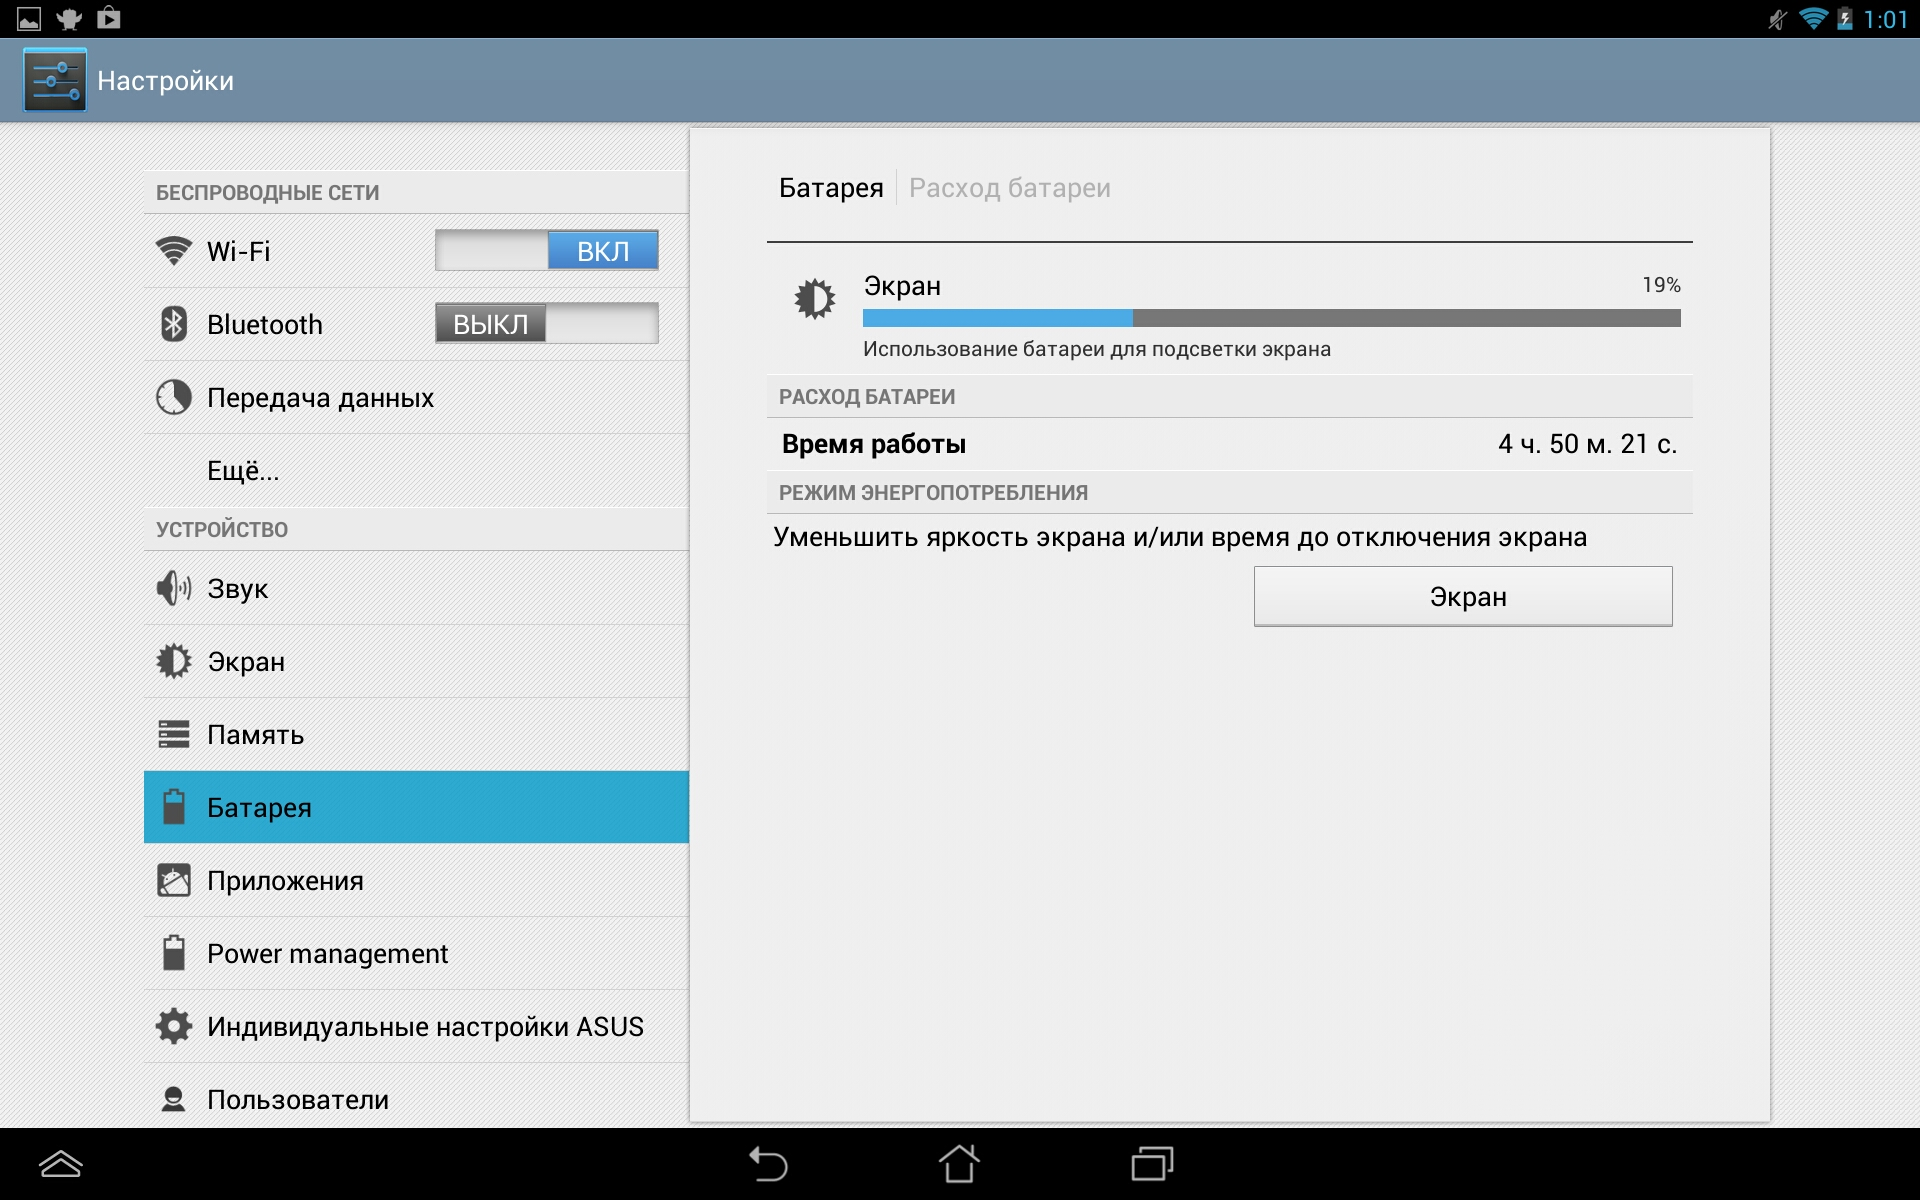 Screenshot_2013-07-12-01-01-42